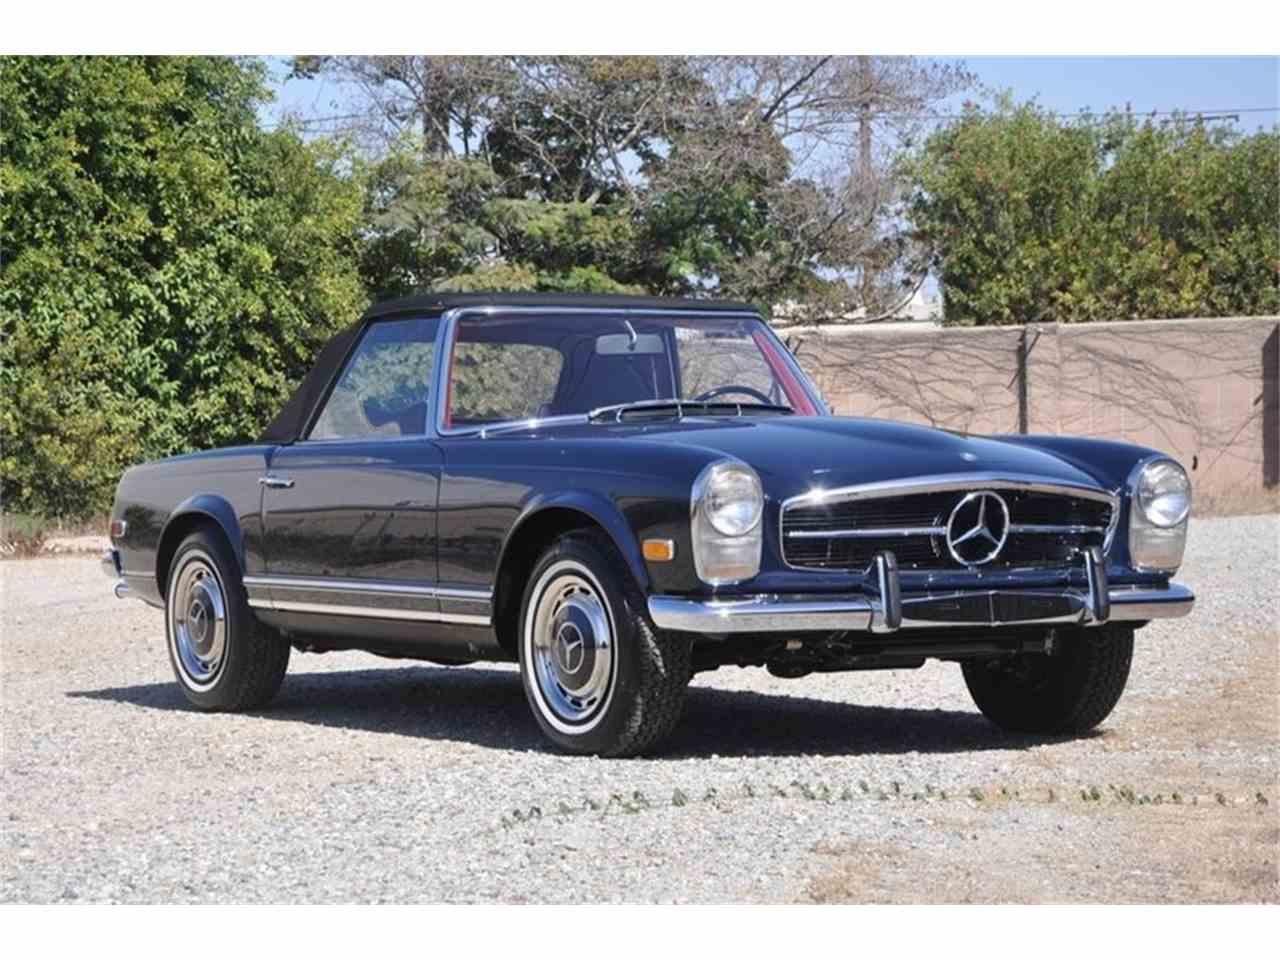 Large Picture of Classic '69 Mercedes-Benz 280SL located in Costa Mesa California - $169,500.00 - JFPJ